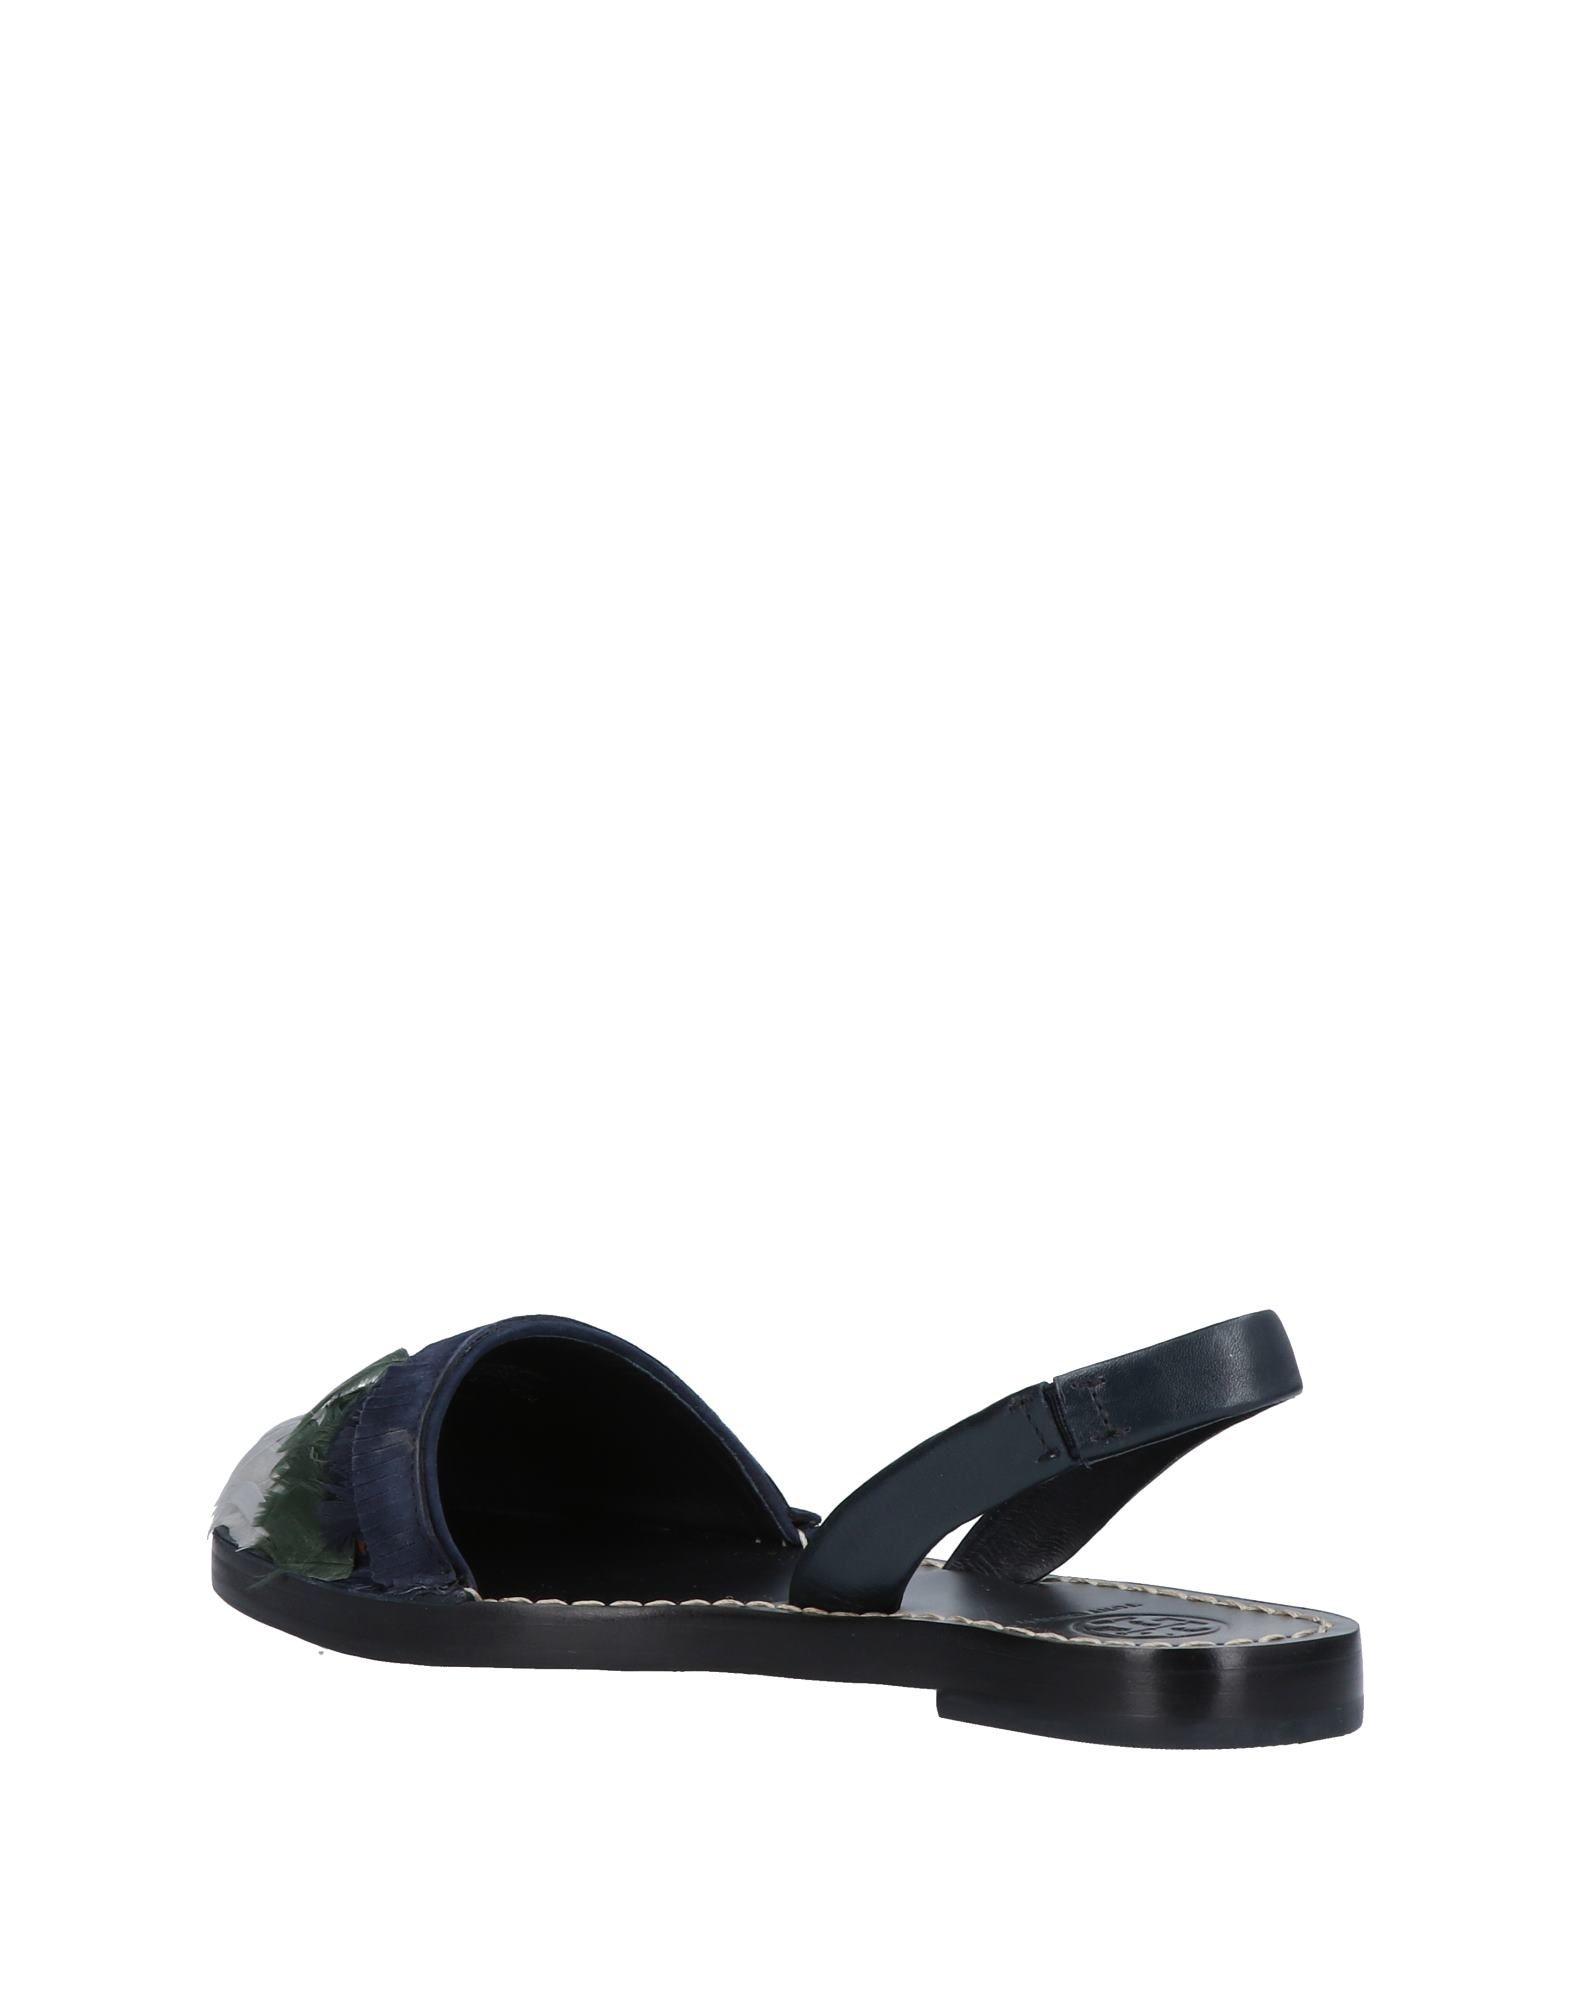 Stilvolle Sandalen billige Schuhe Tory Burch Sandalen Stilvolle Damen  11453268AA 061ffe